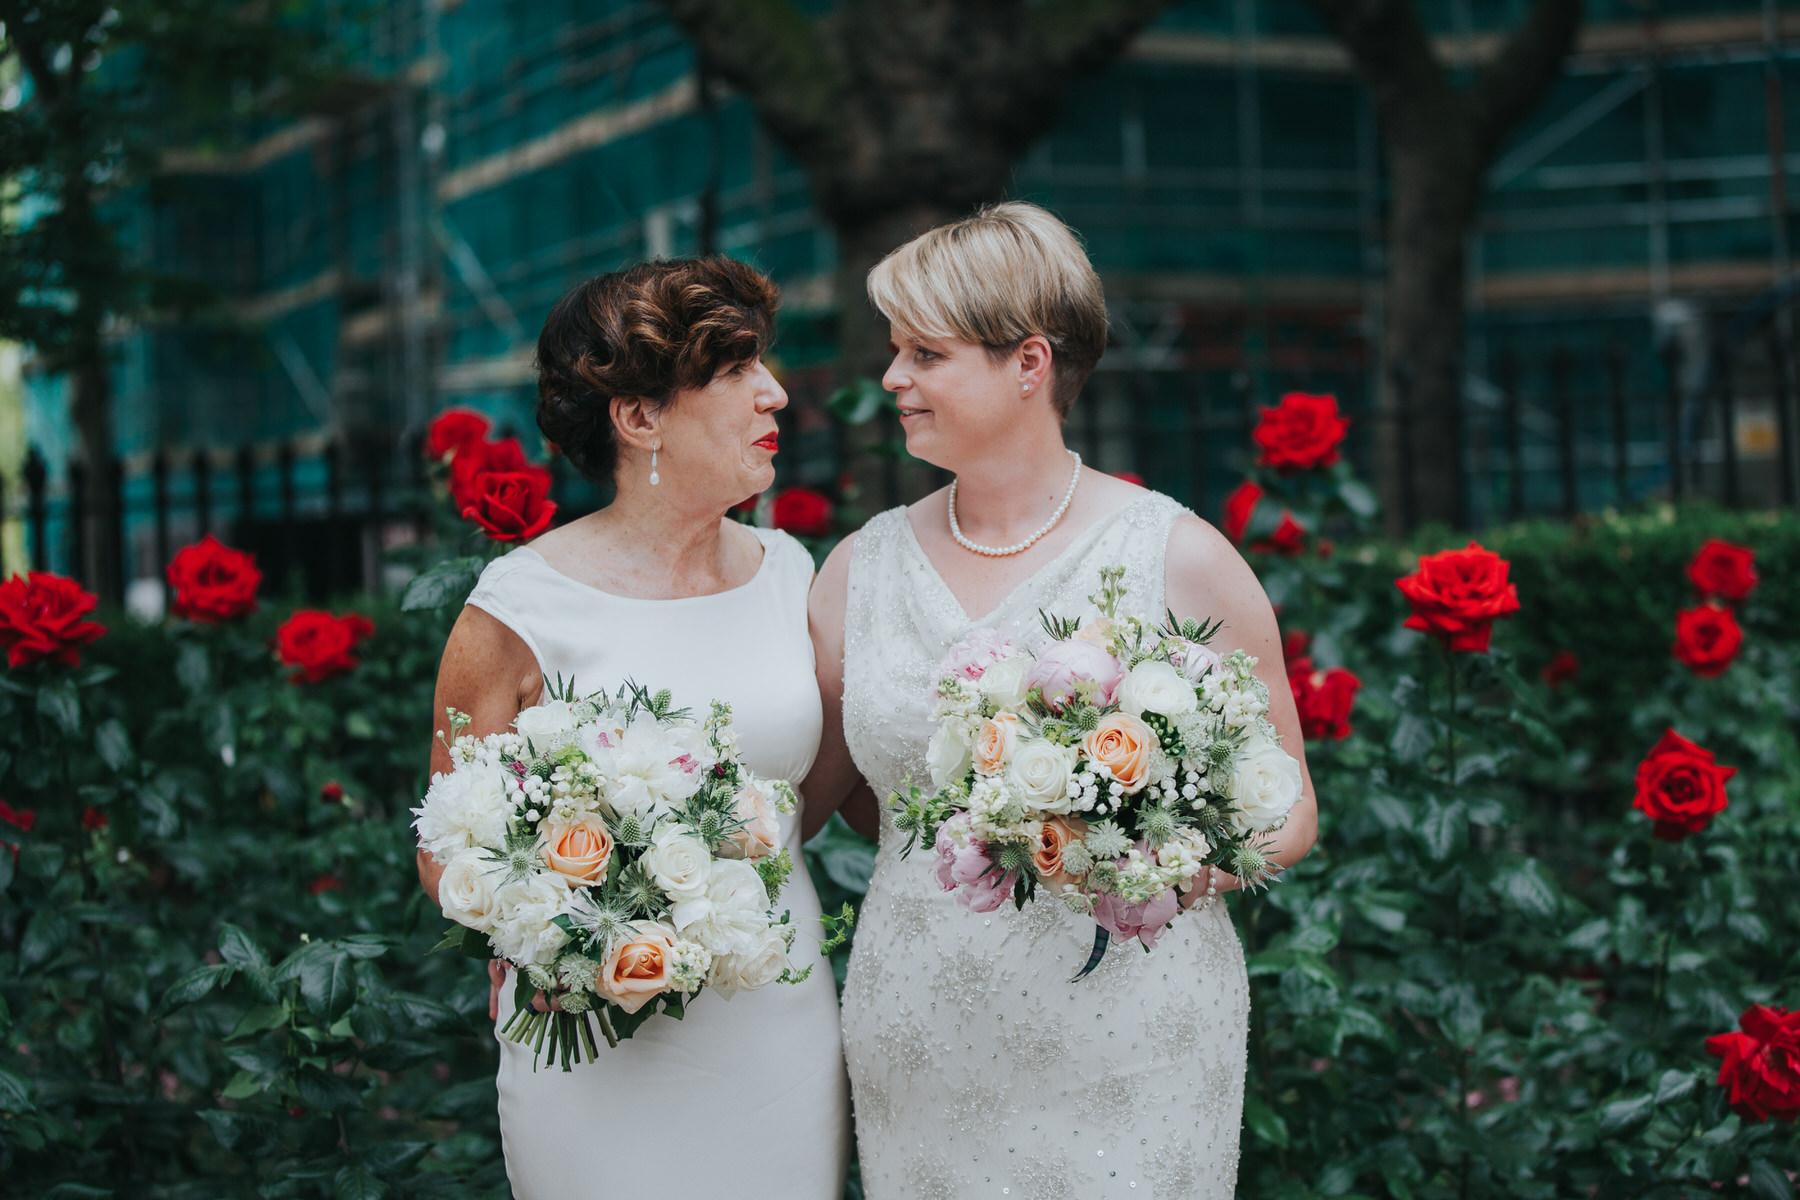 151 red roses Islington park two brides couple portraits.jpg